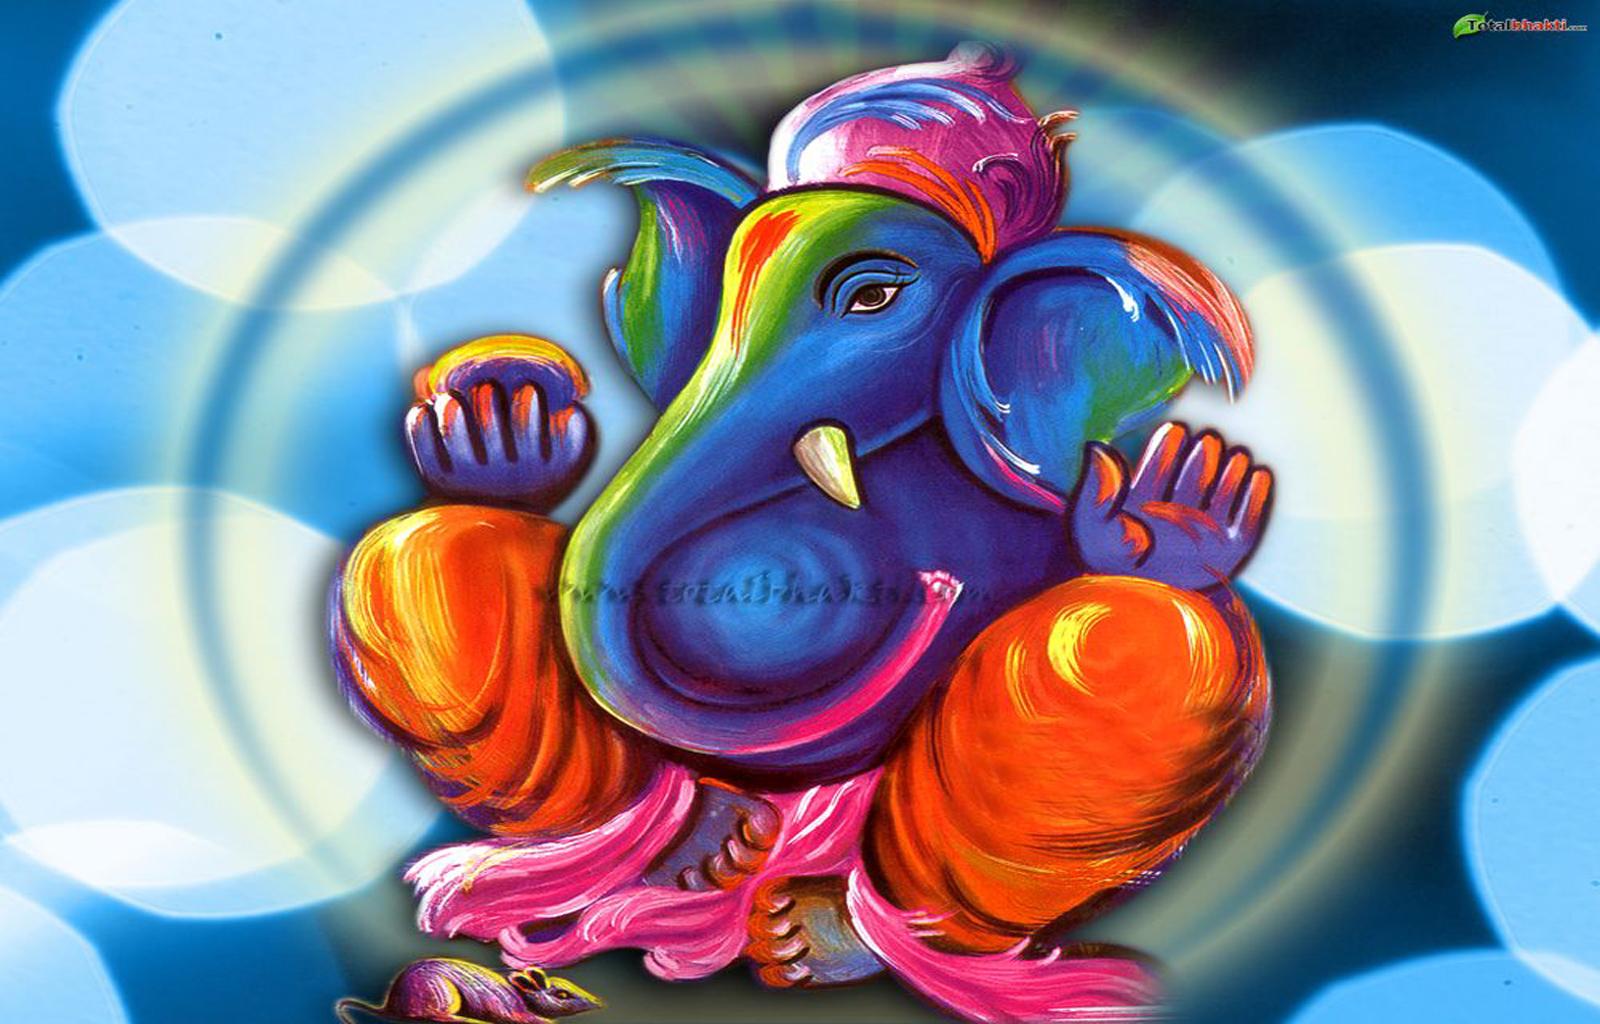 Making sense of ganesh stories the hindu perspective ganeshms buycottarizona